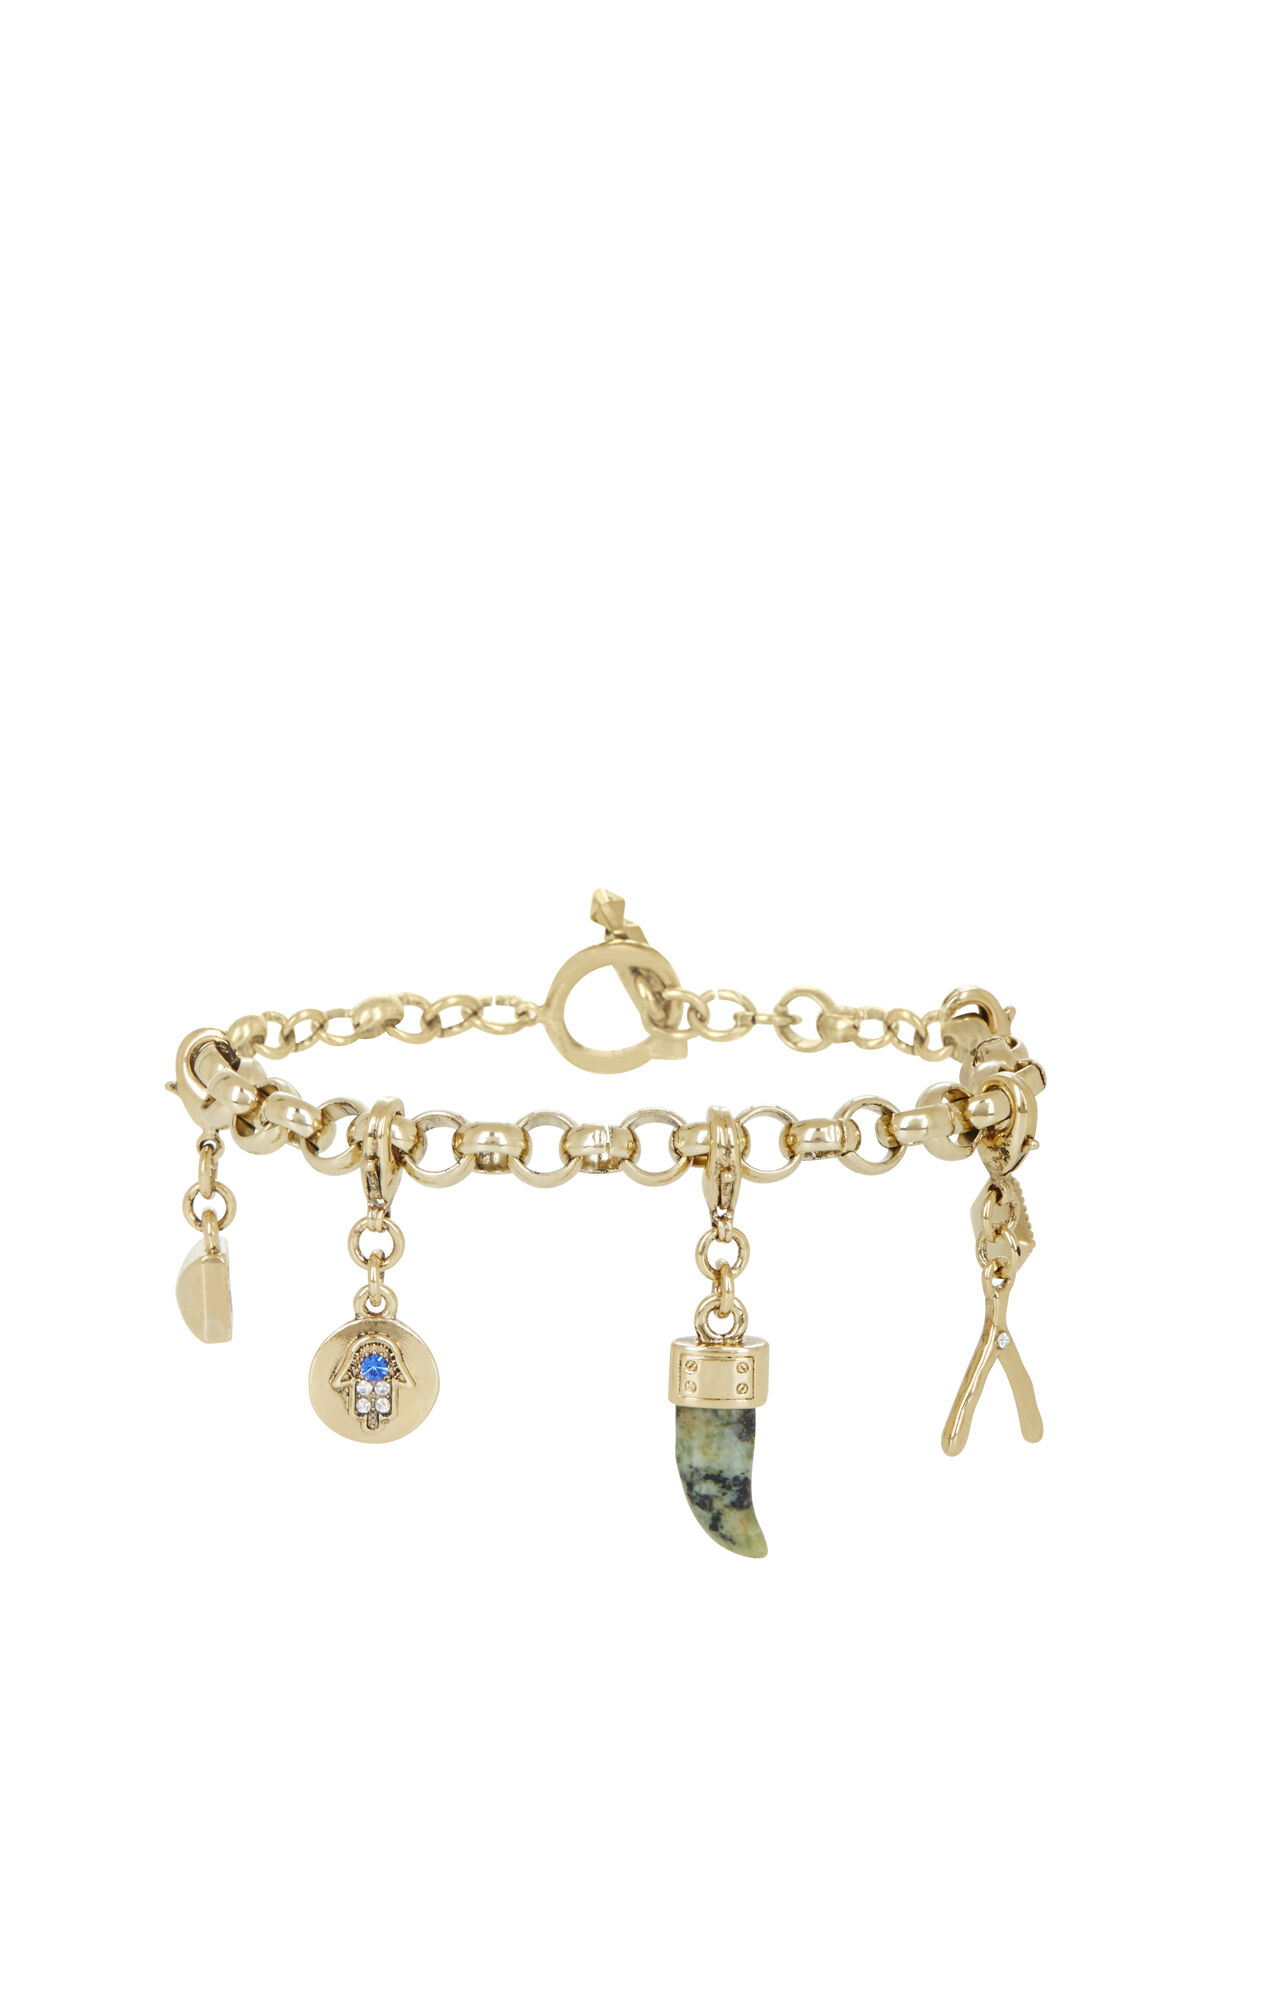 BCBG Charm Bracelet